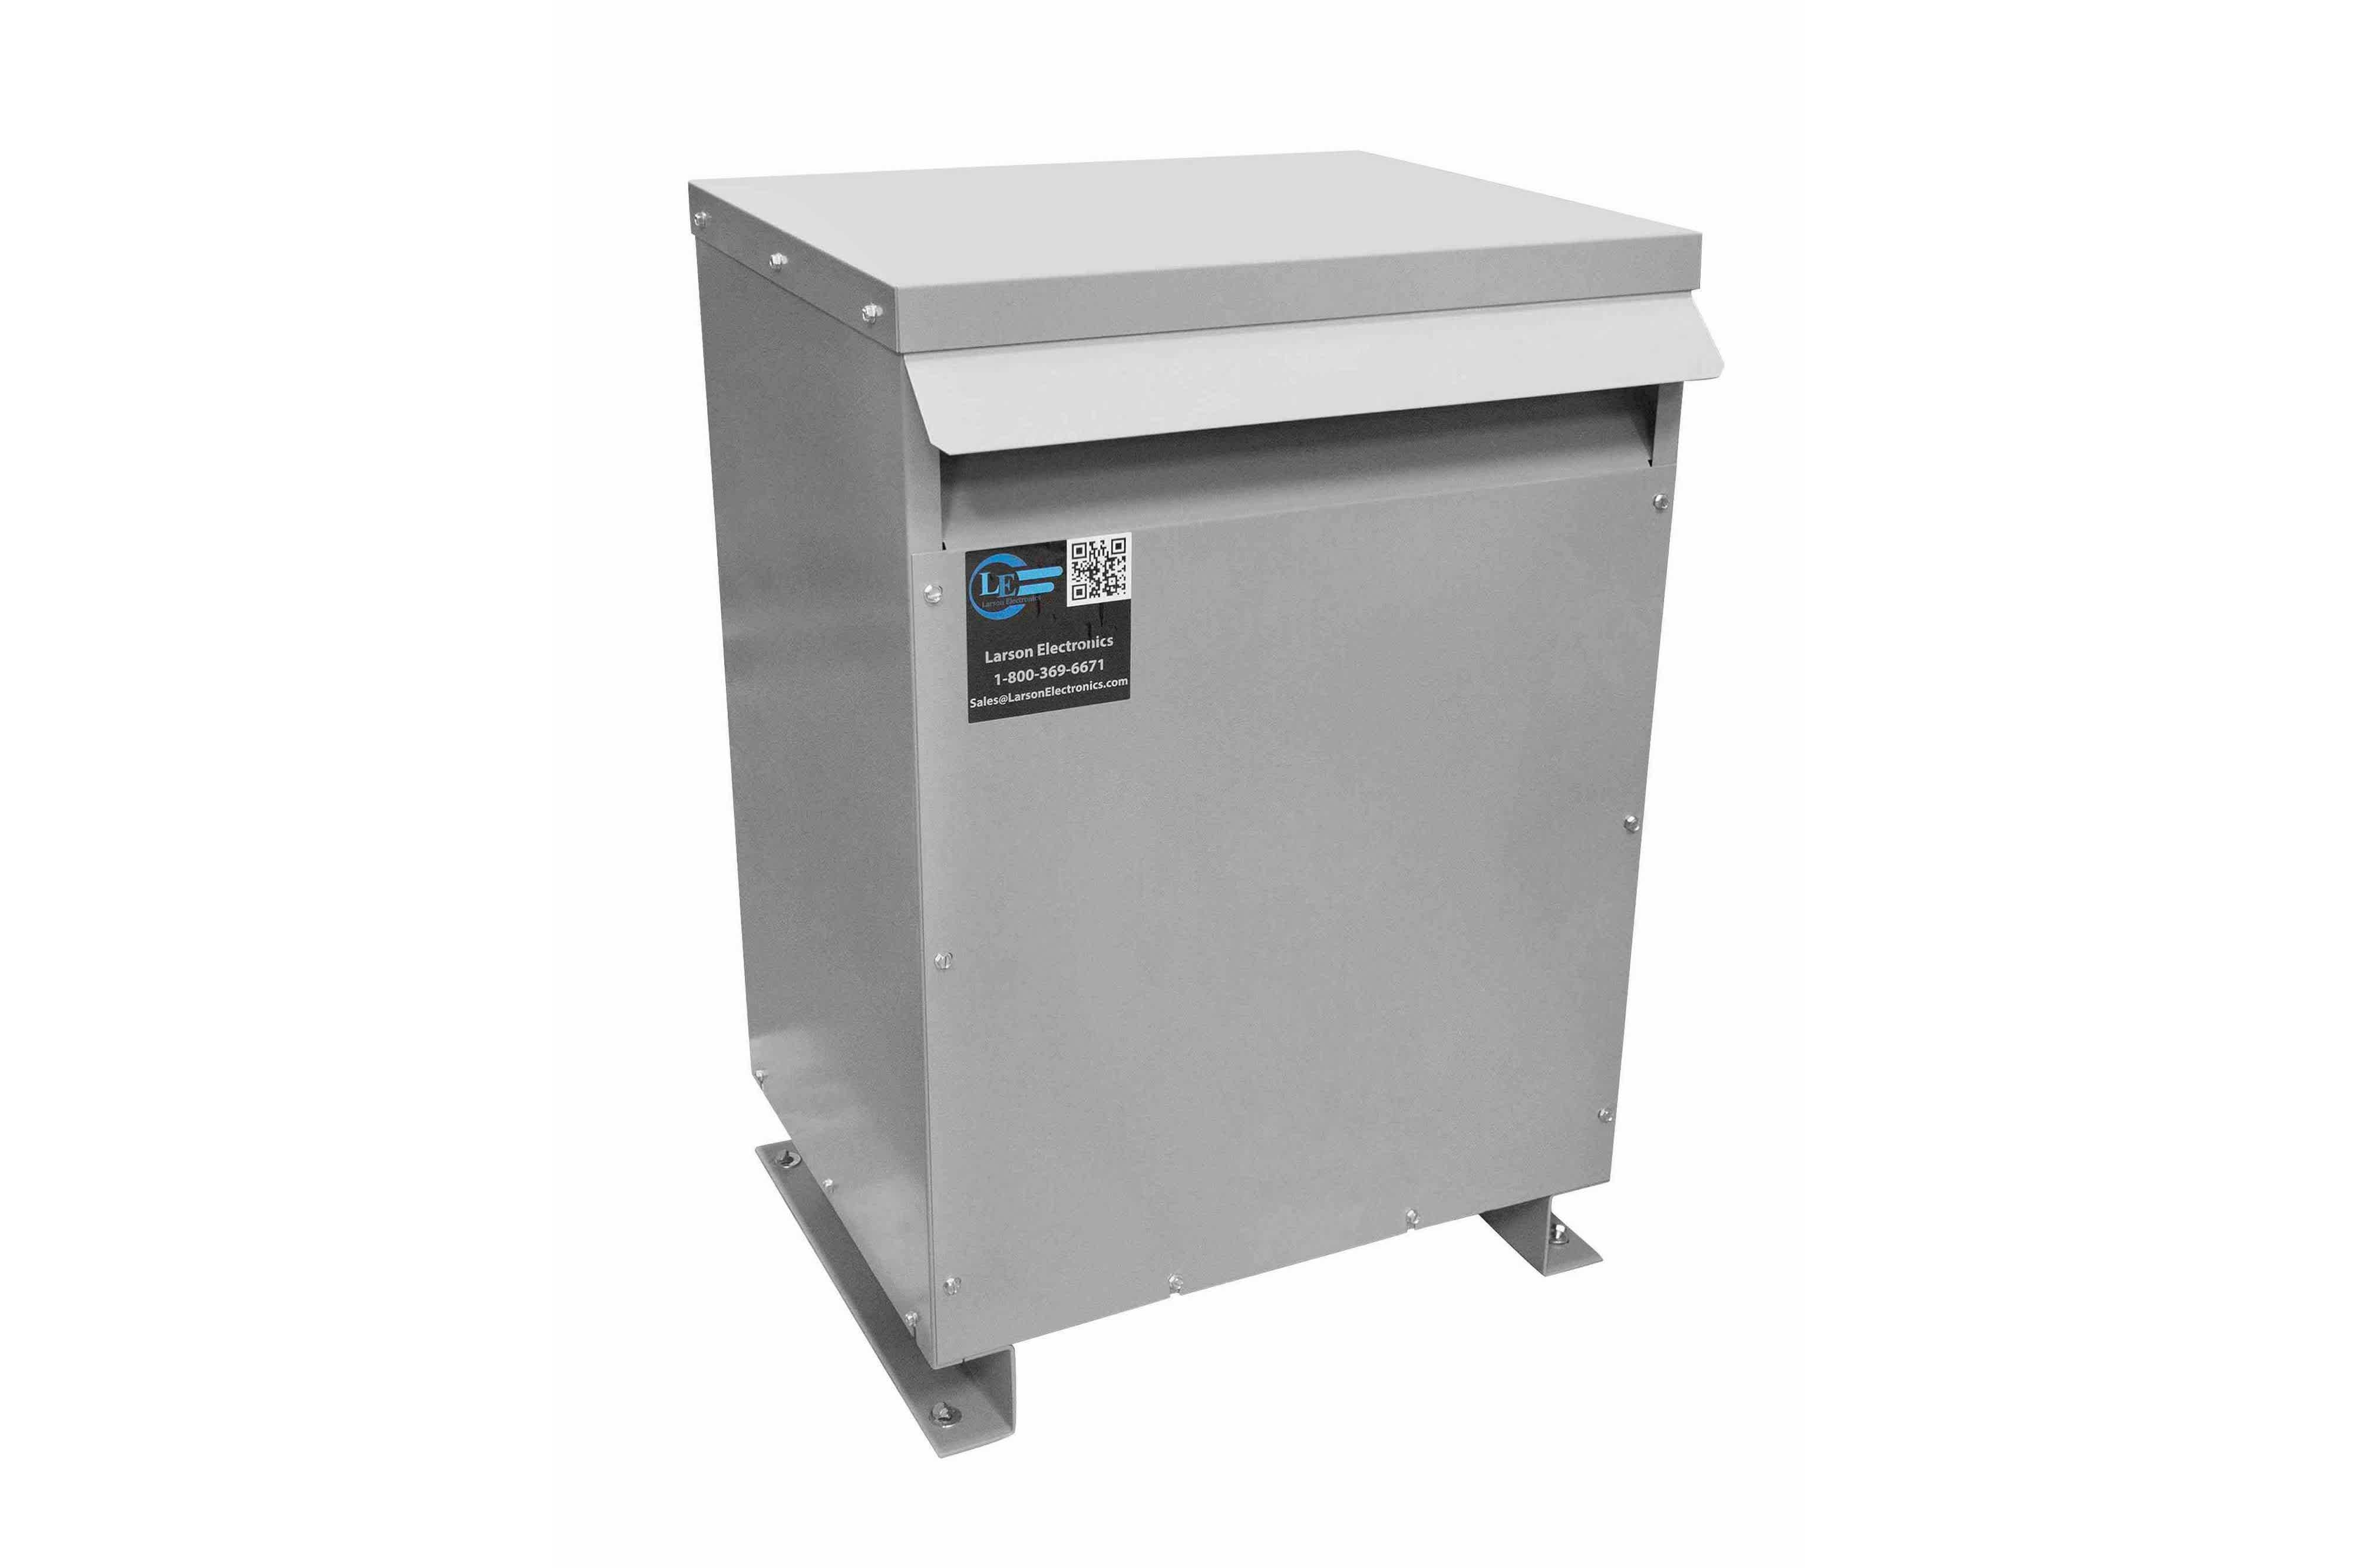 29 kVA 3PH Isolation Transformer, 480V Wye Primary, 400V Delta Secondary, N3R, Ventilated, 60 Hz